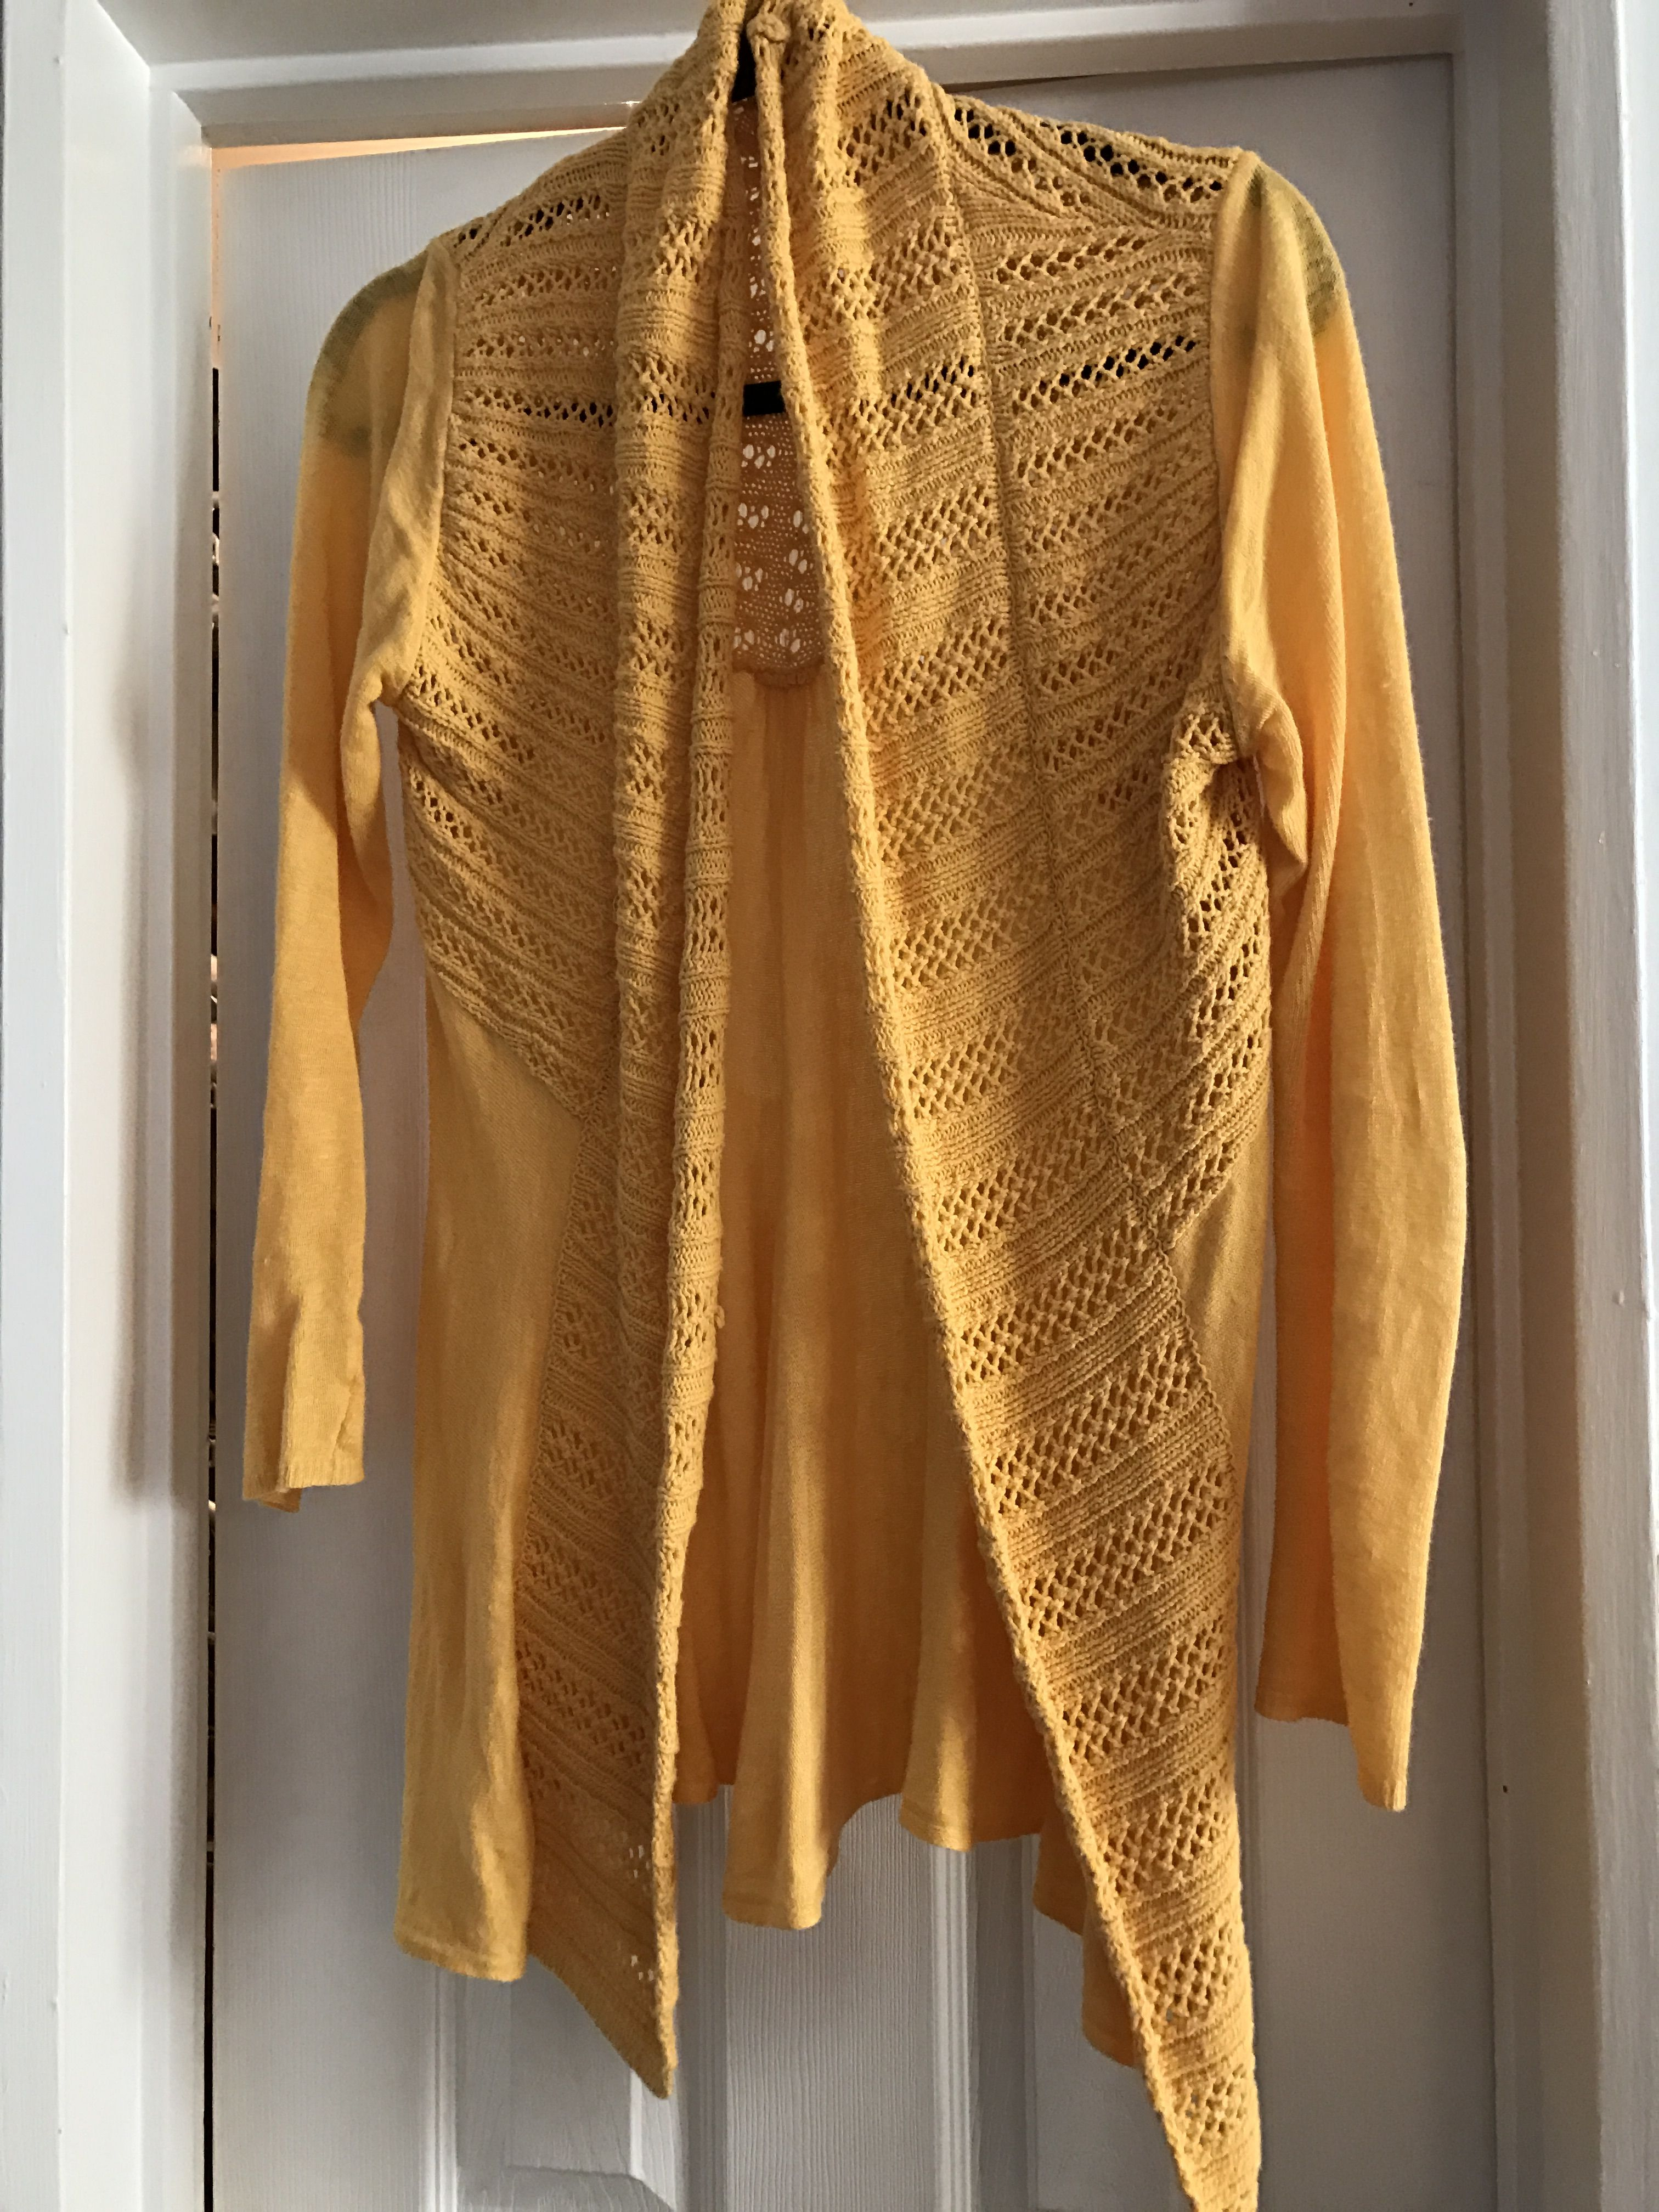 Anthropologie mustard cardigan https://www.stitchfix.com/referral/5969431?sod=w&som=c